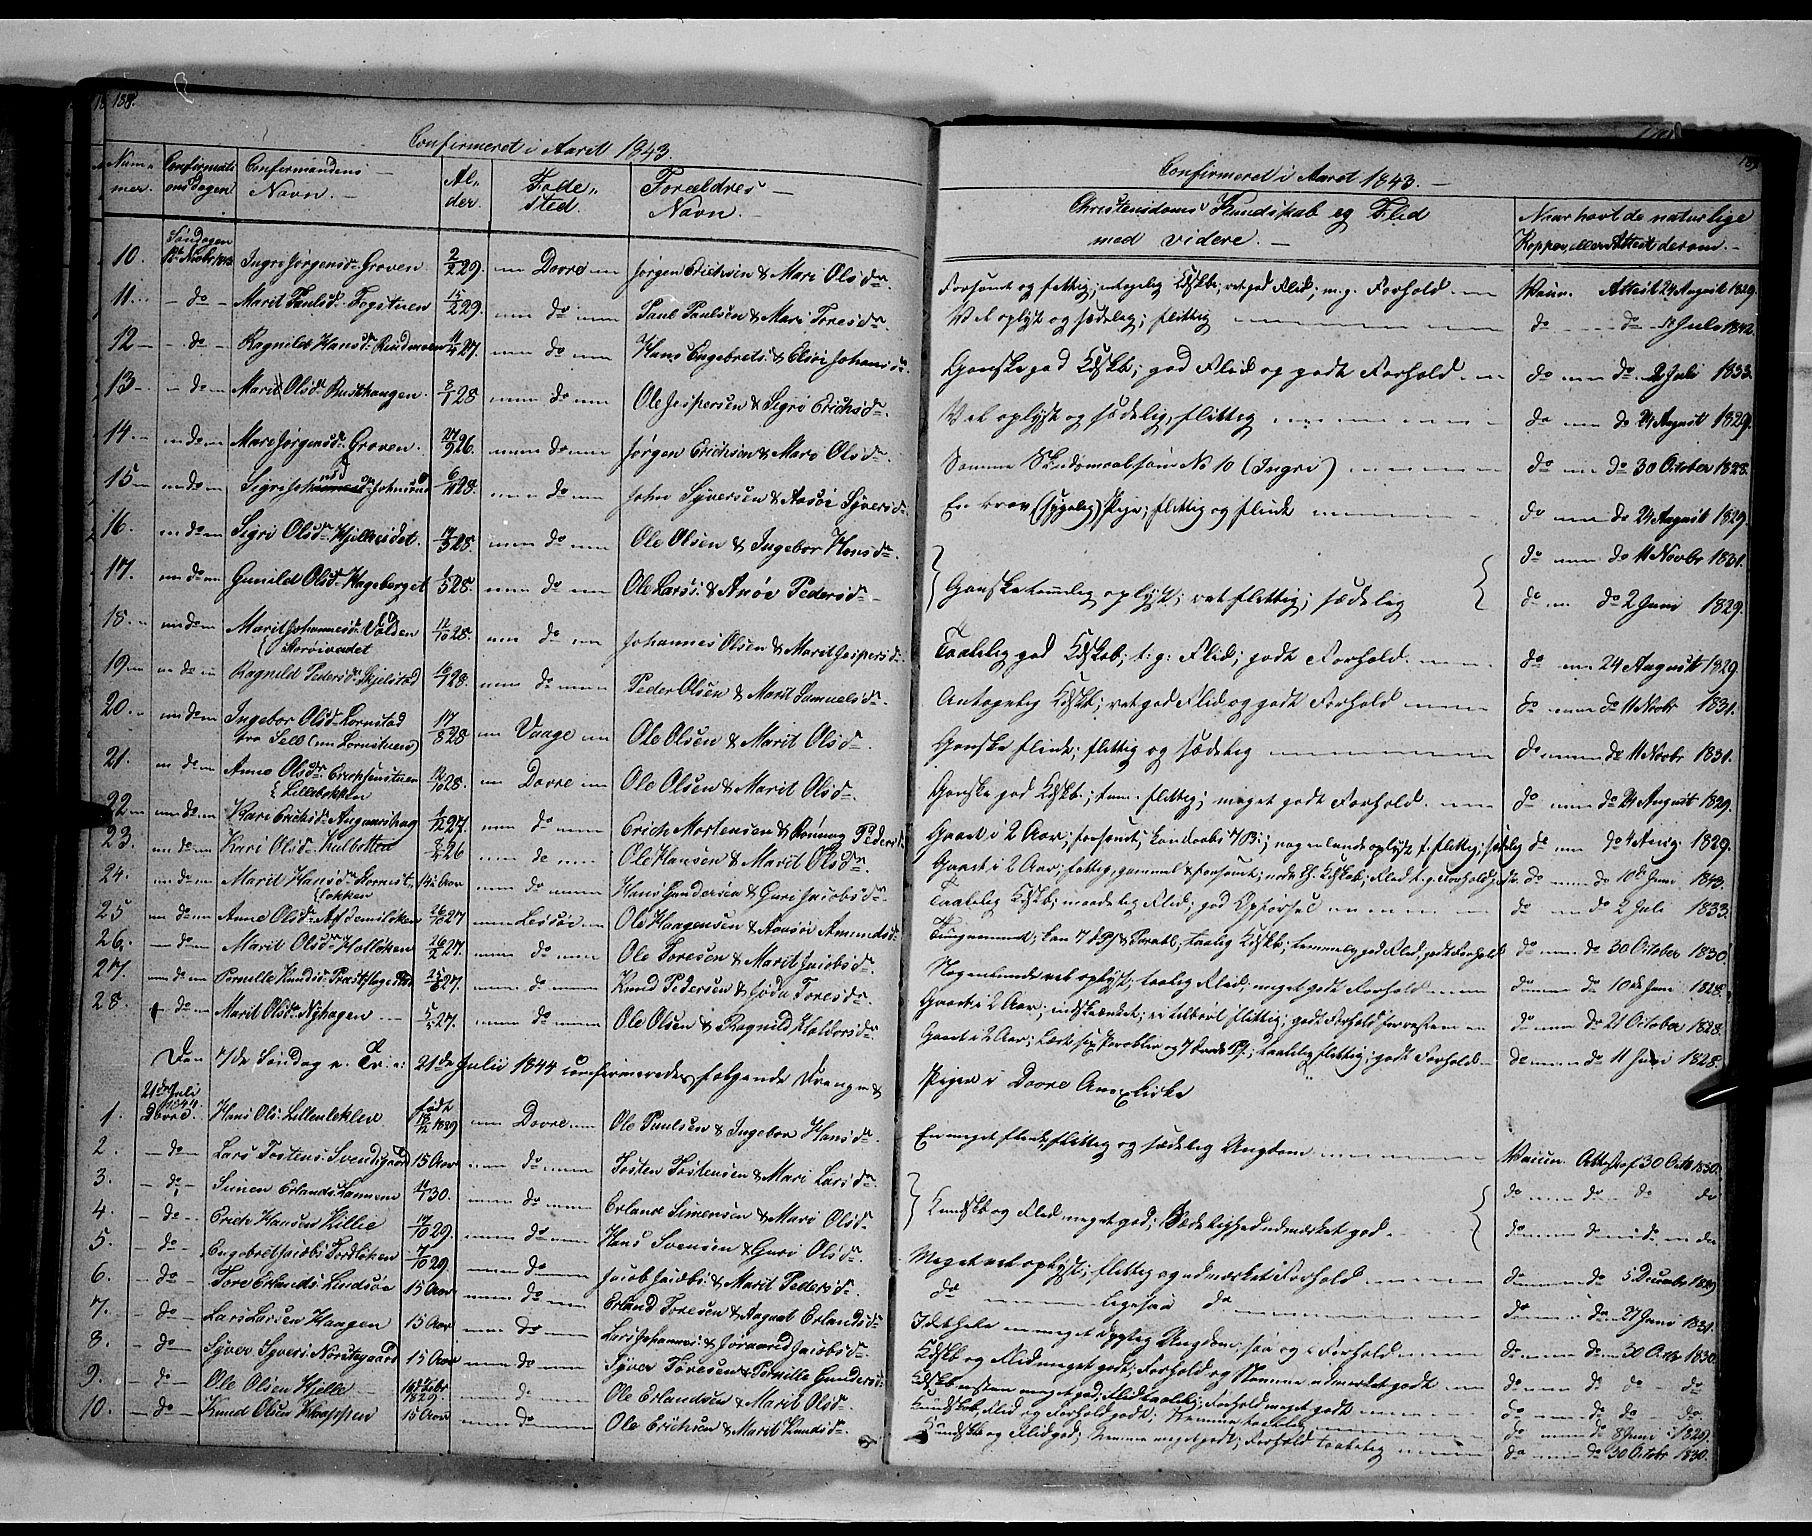 SAH, Lesja prestekontor, Klokkerbok nr. 3, 1842-1862, s. 188-189